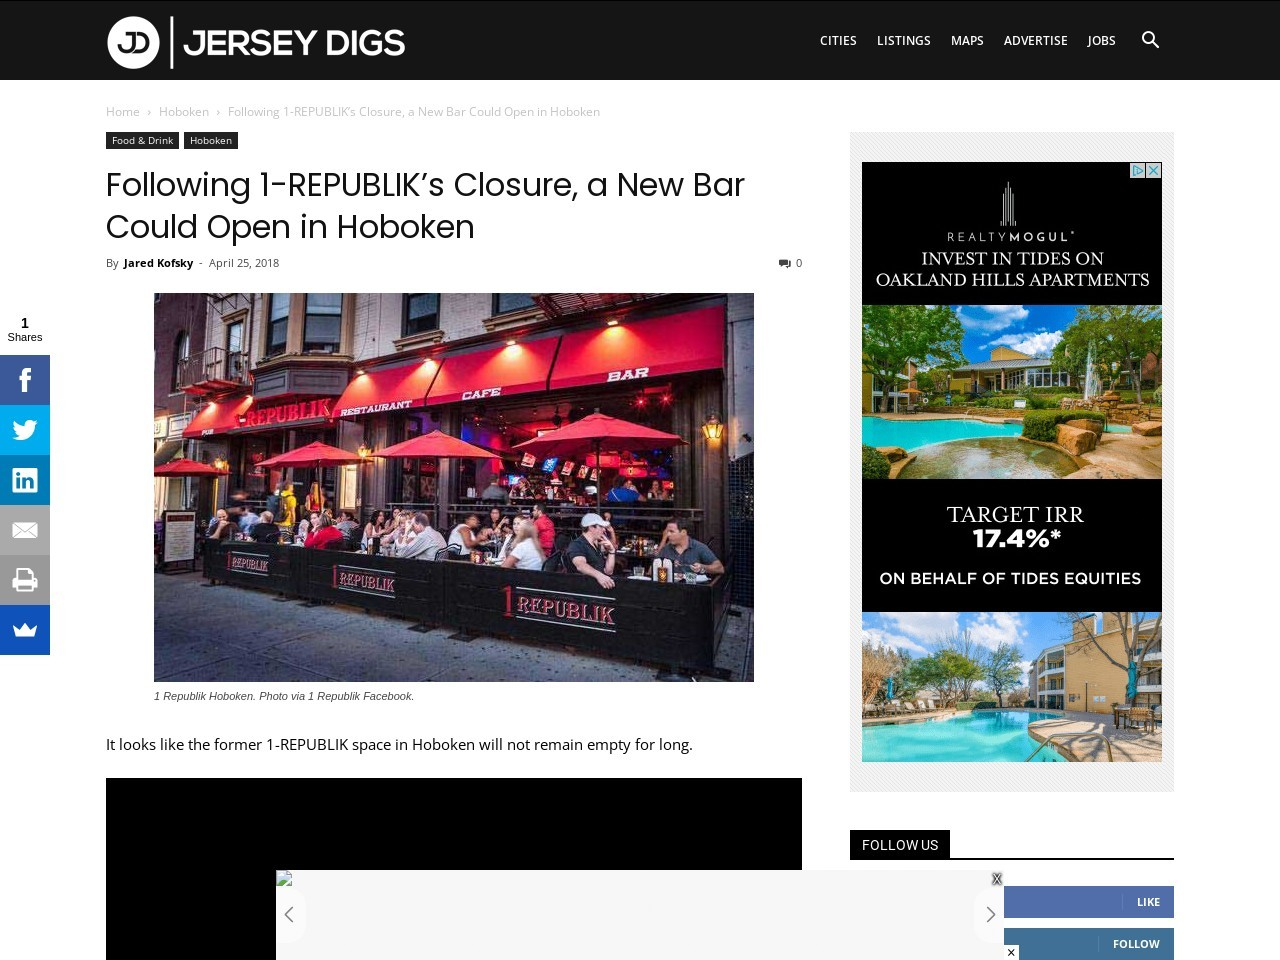 Following 1-REPUBLIK's Closure, a New Bar Could Open in Hoboken